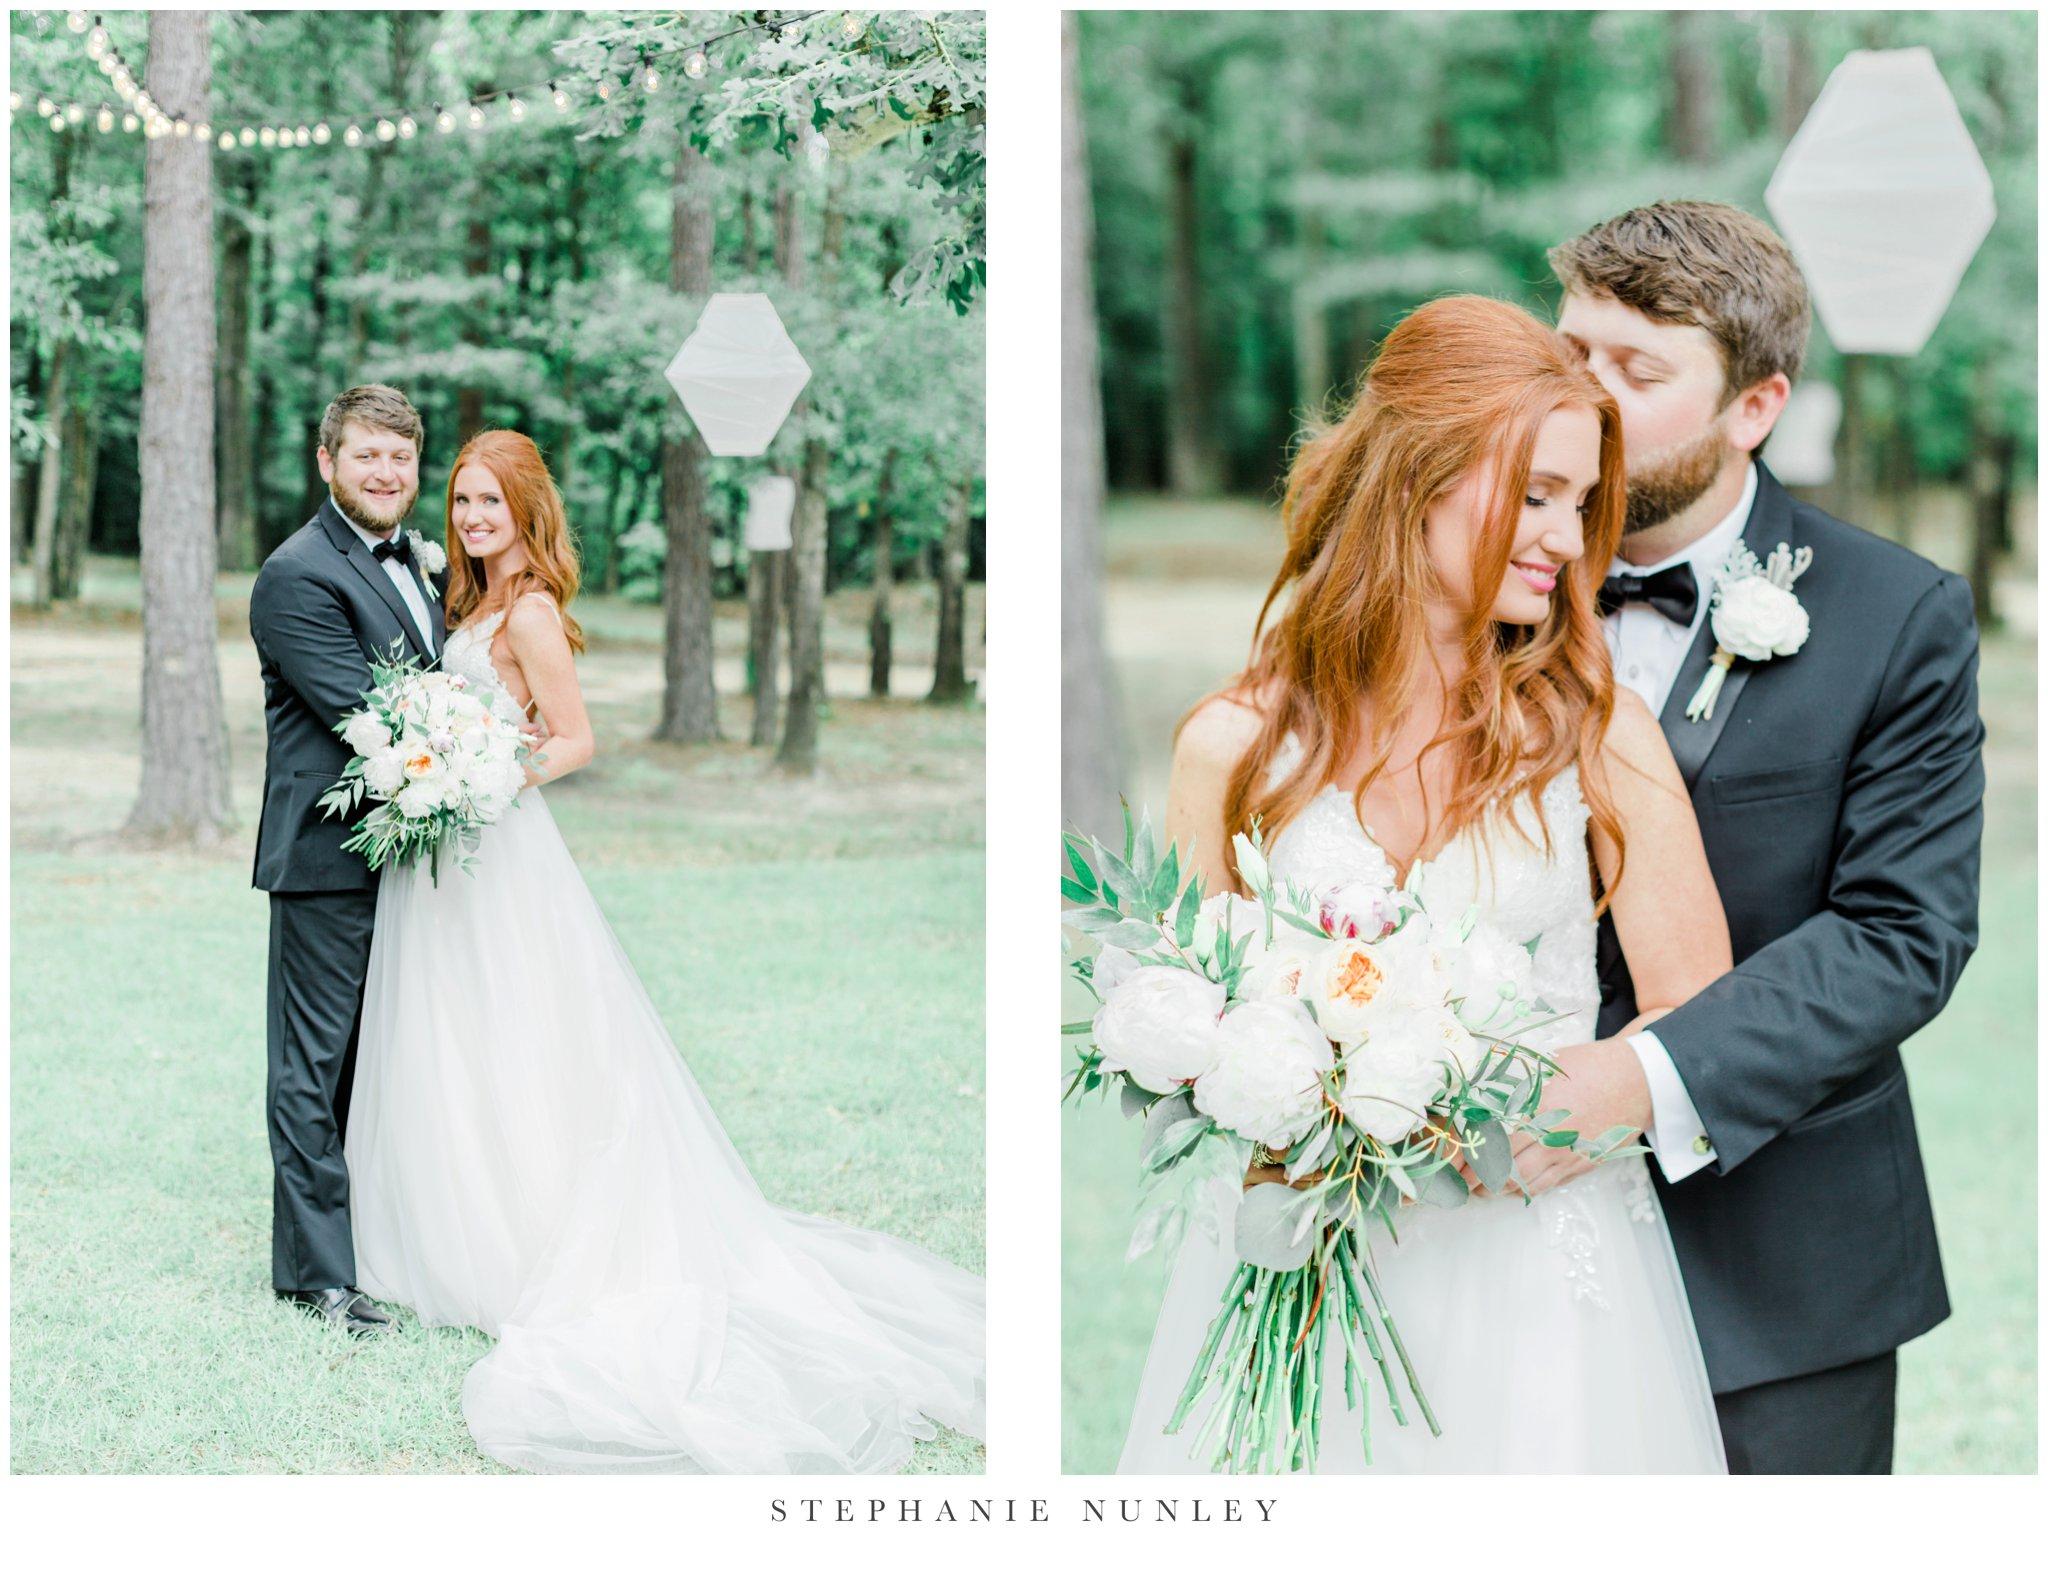 blessing-tree-farm-arkansas-wedding-0034.jpg